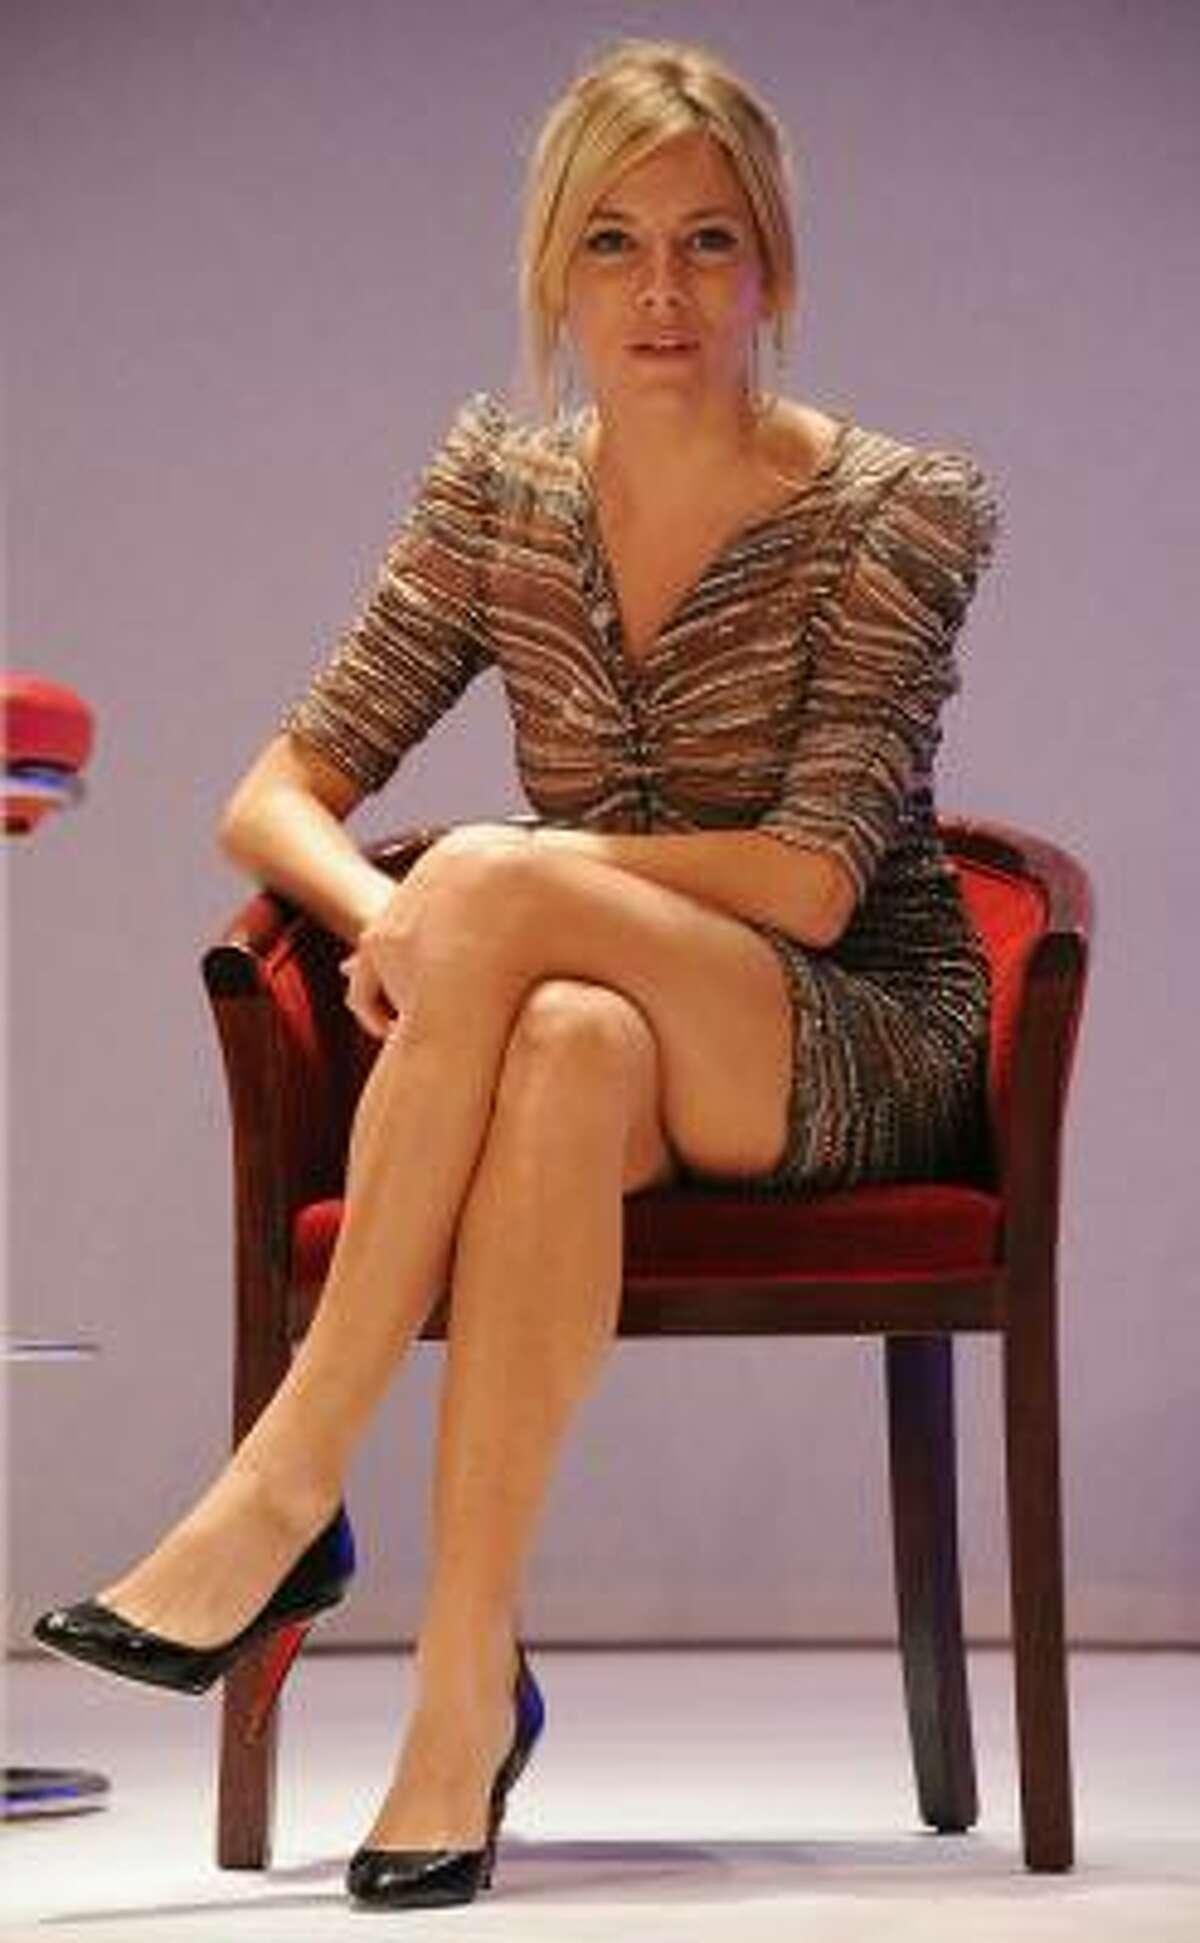 Sienna Miller Turns 30 on December 28.